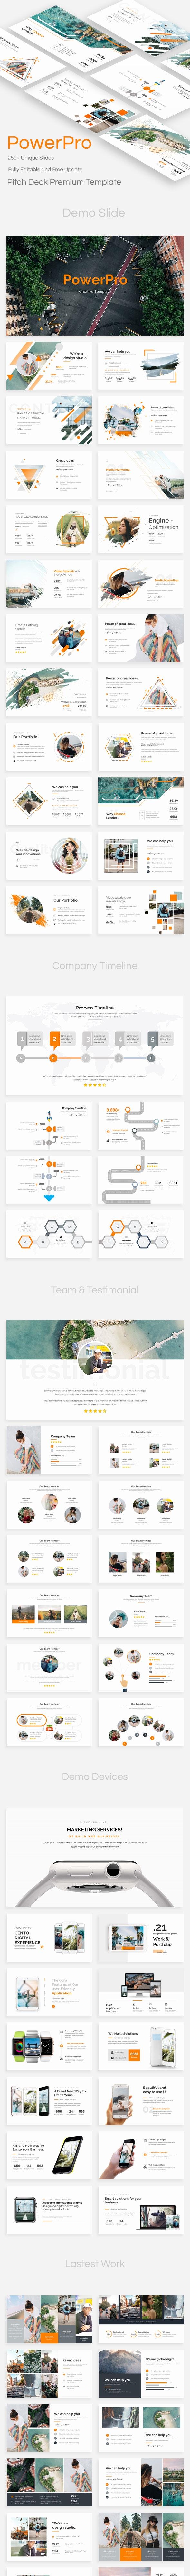 Powerpro Pitch Deck Powerpoint Template - Business PowerPoint Templates